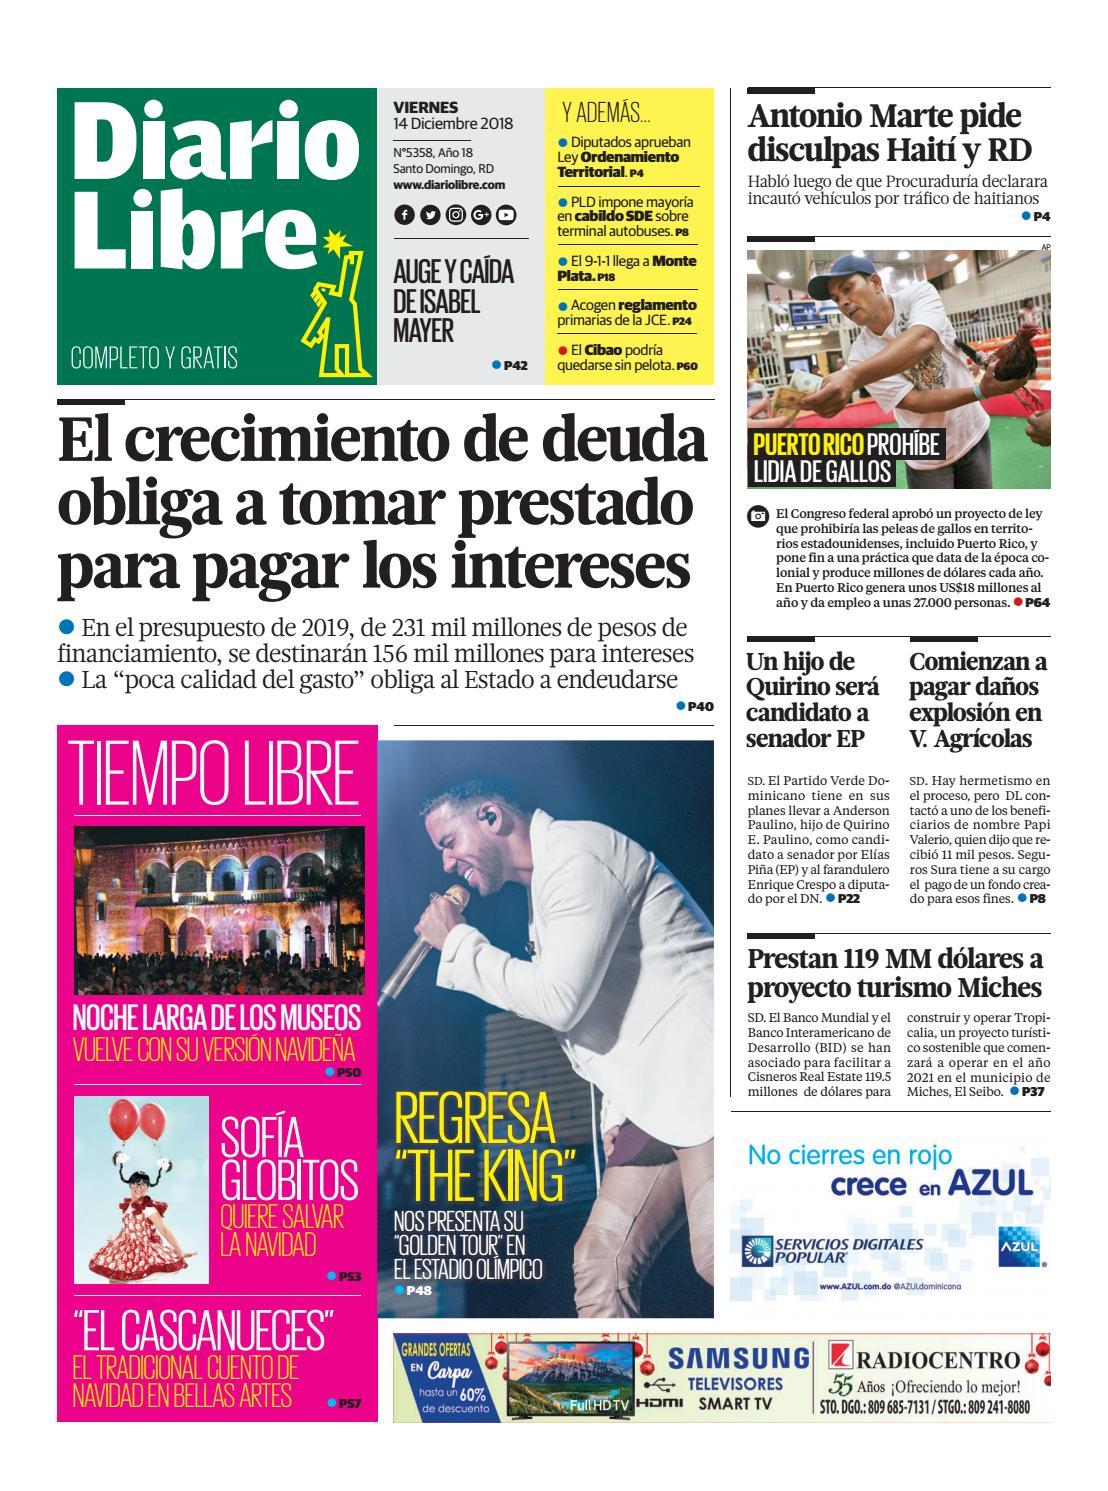 Portada Periódico Diario Libre, Viernes 14 de Diciembre 2018